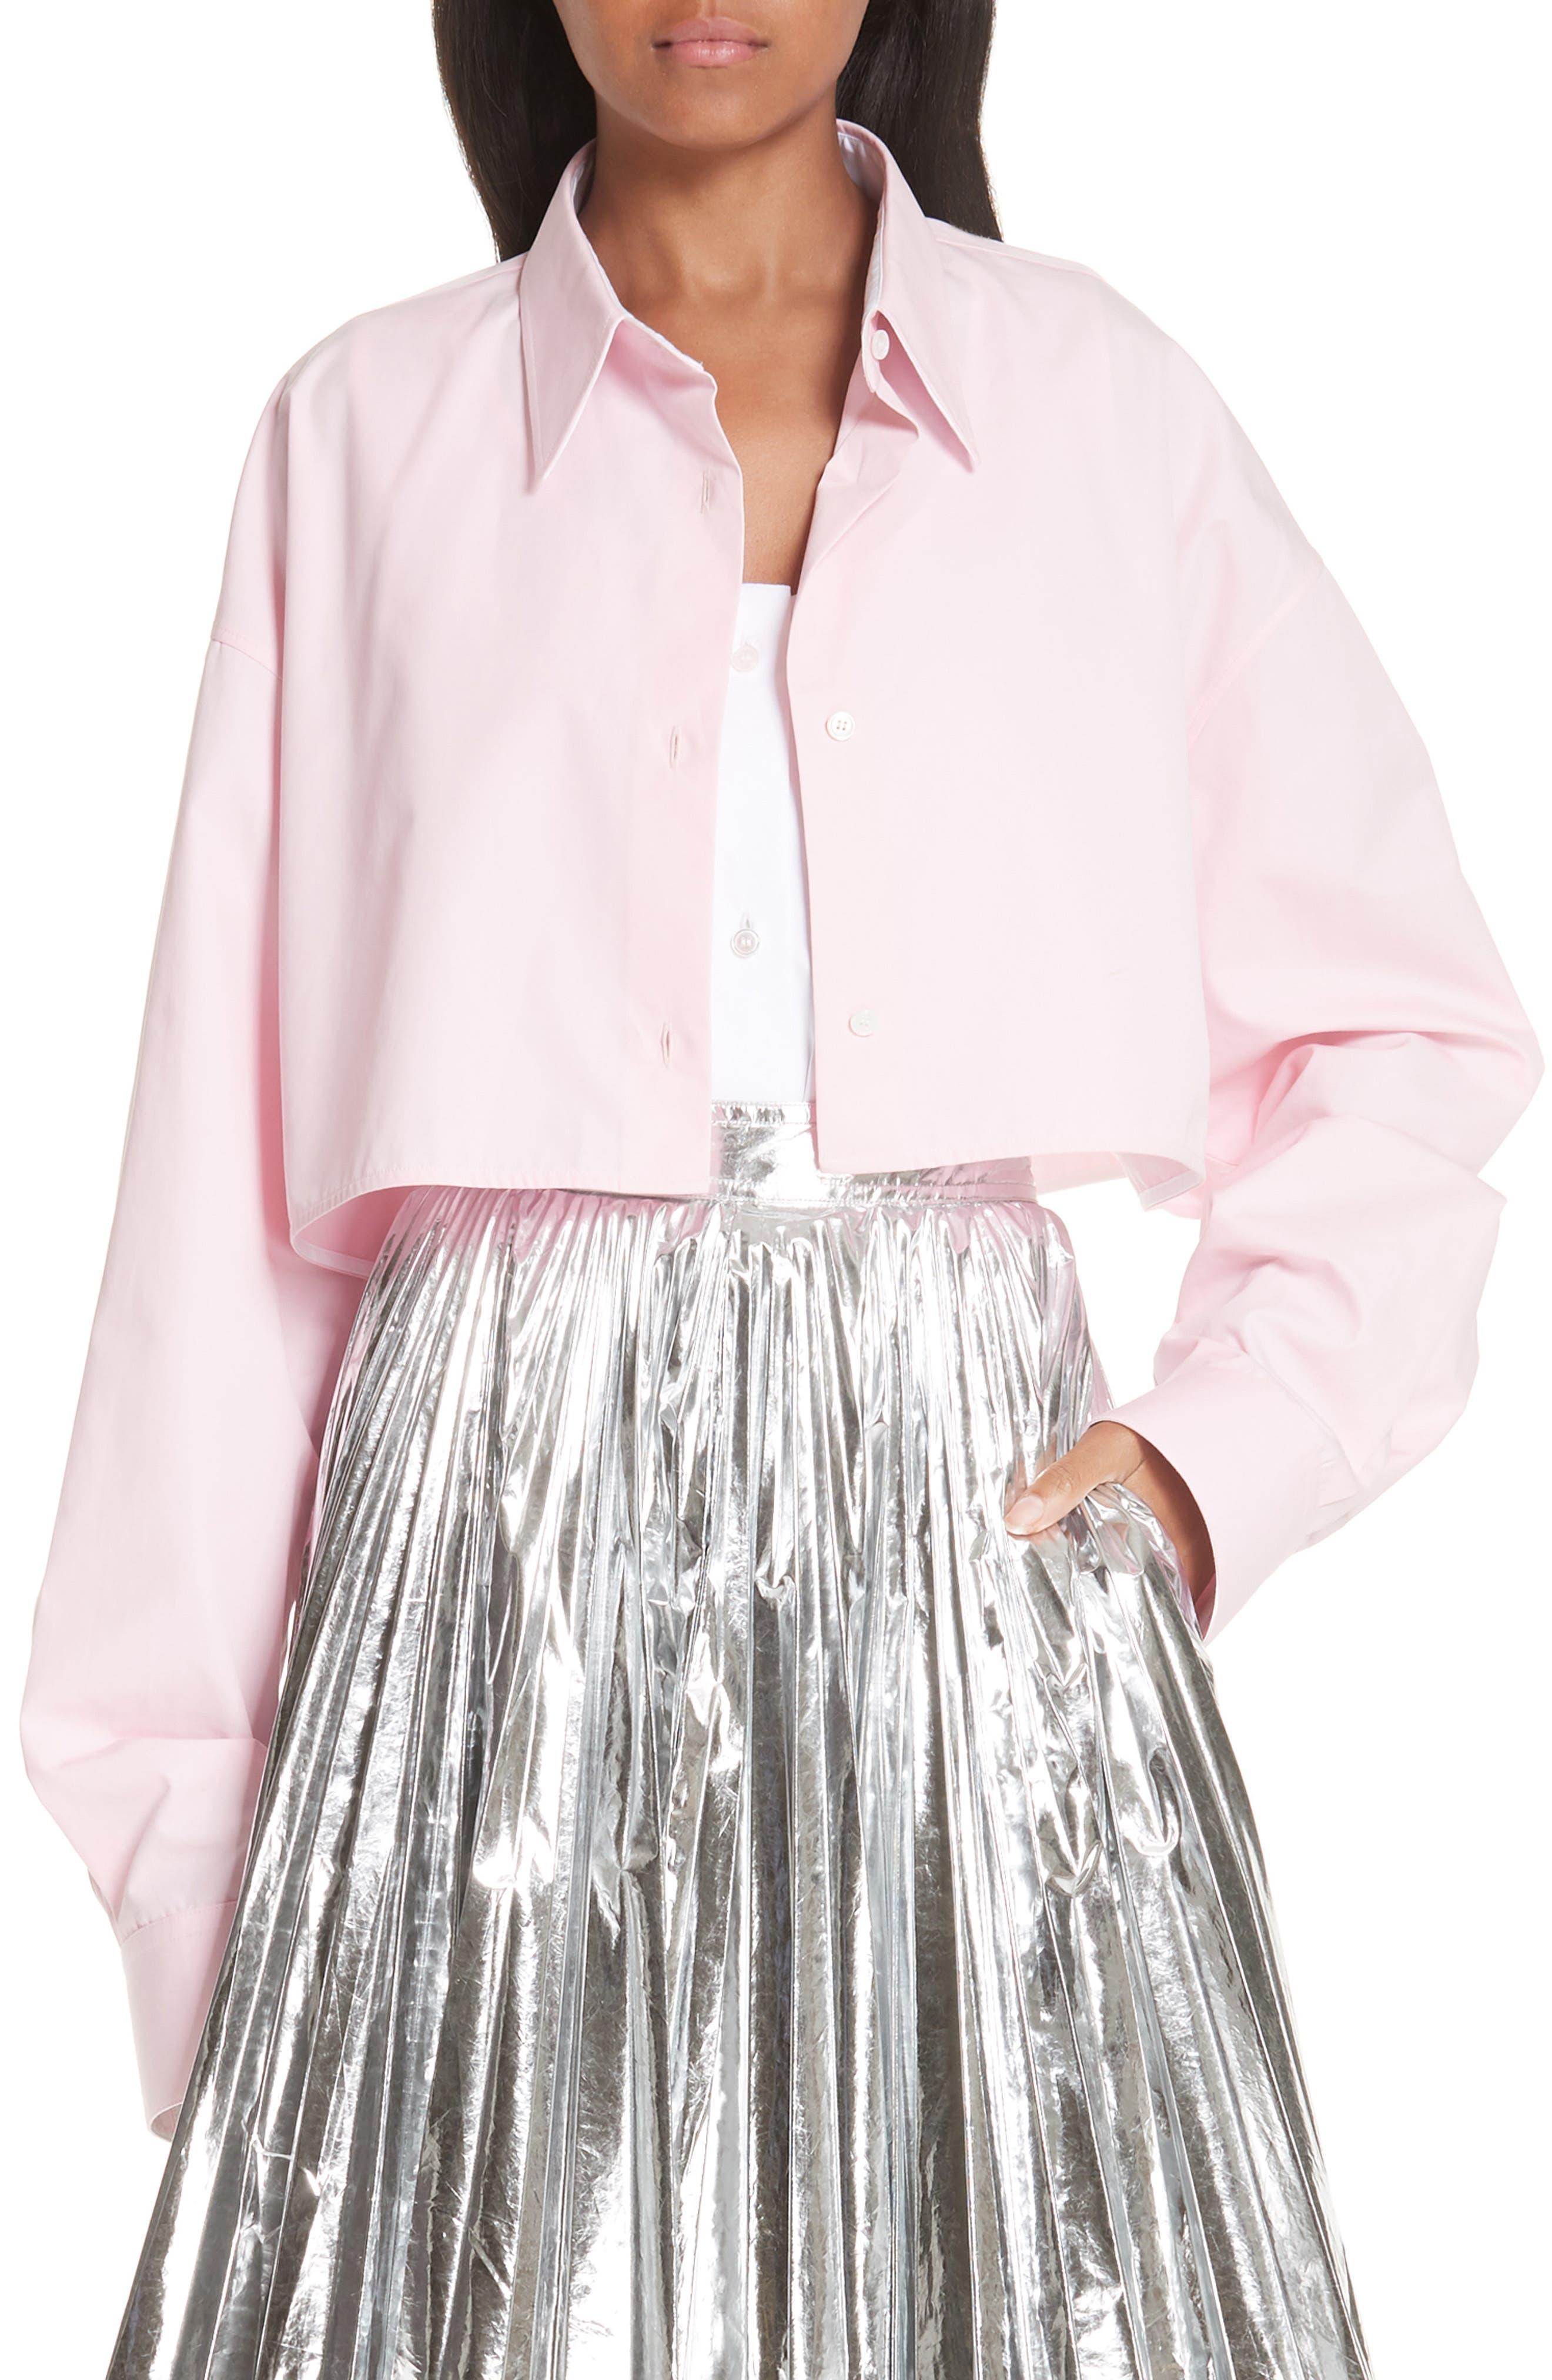 CALVIN KLEIN 205W39NYC Layered Cotton Poplin Shirt, Main, color, ROSE OPTIC WHITE